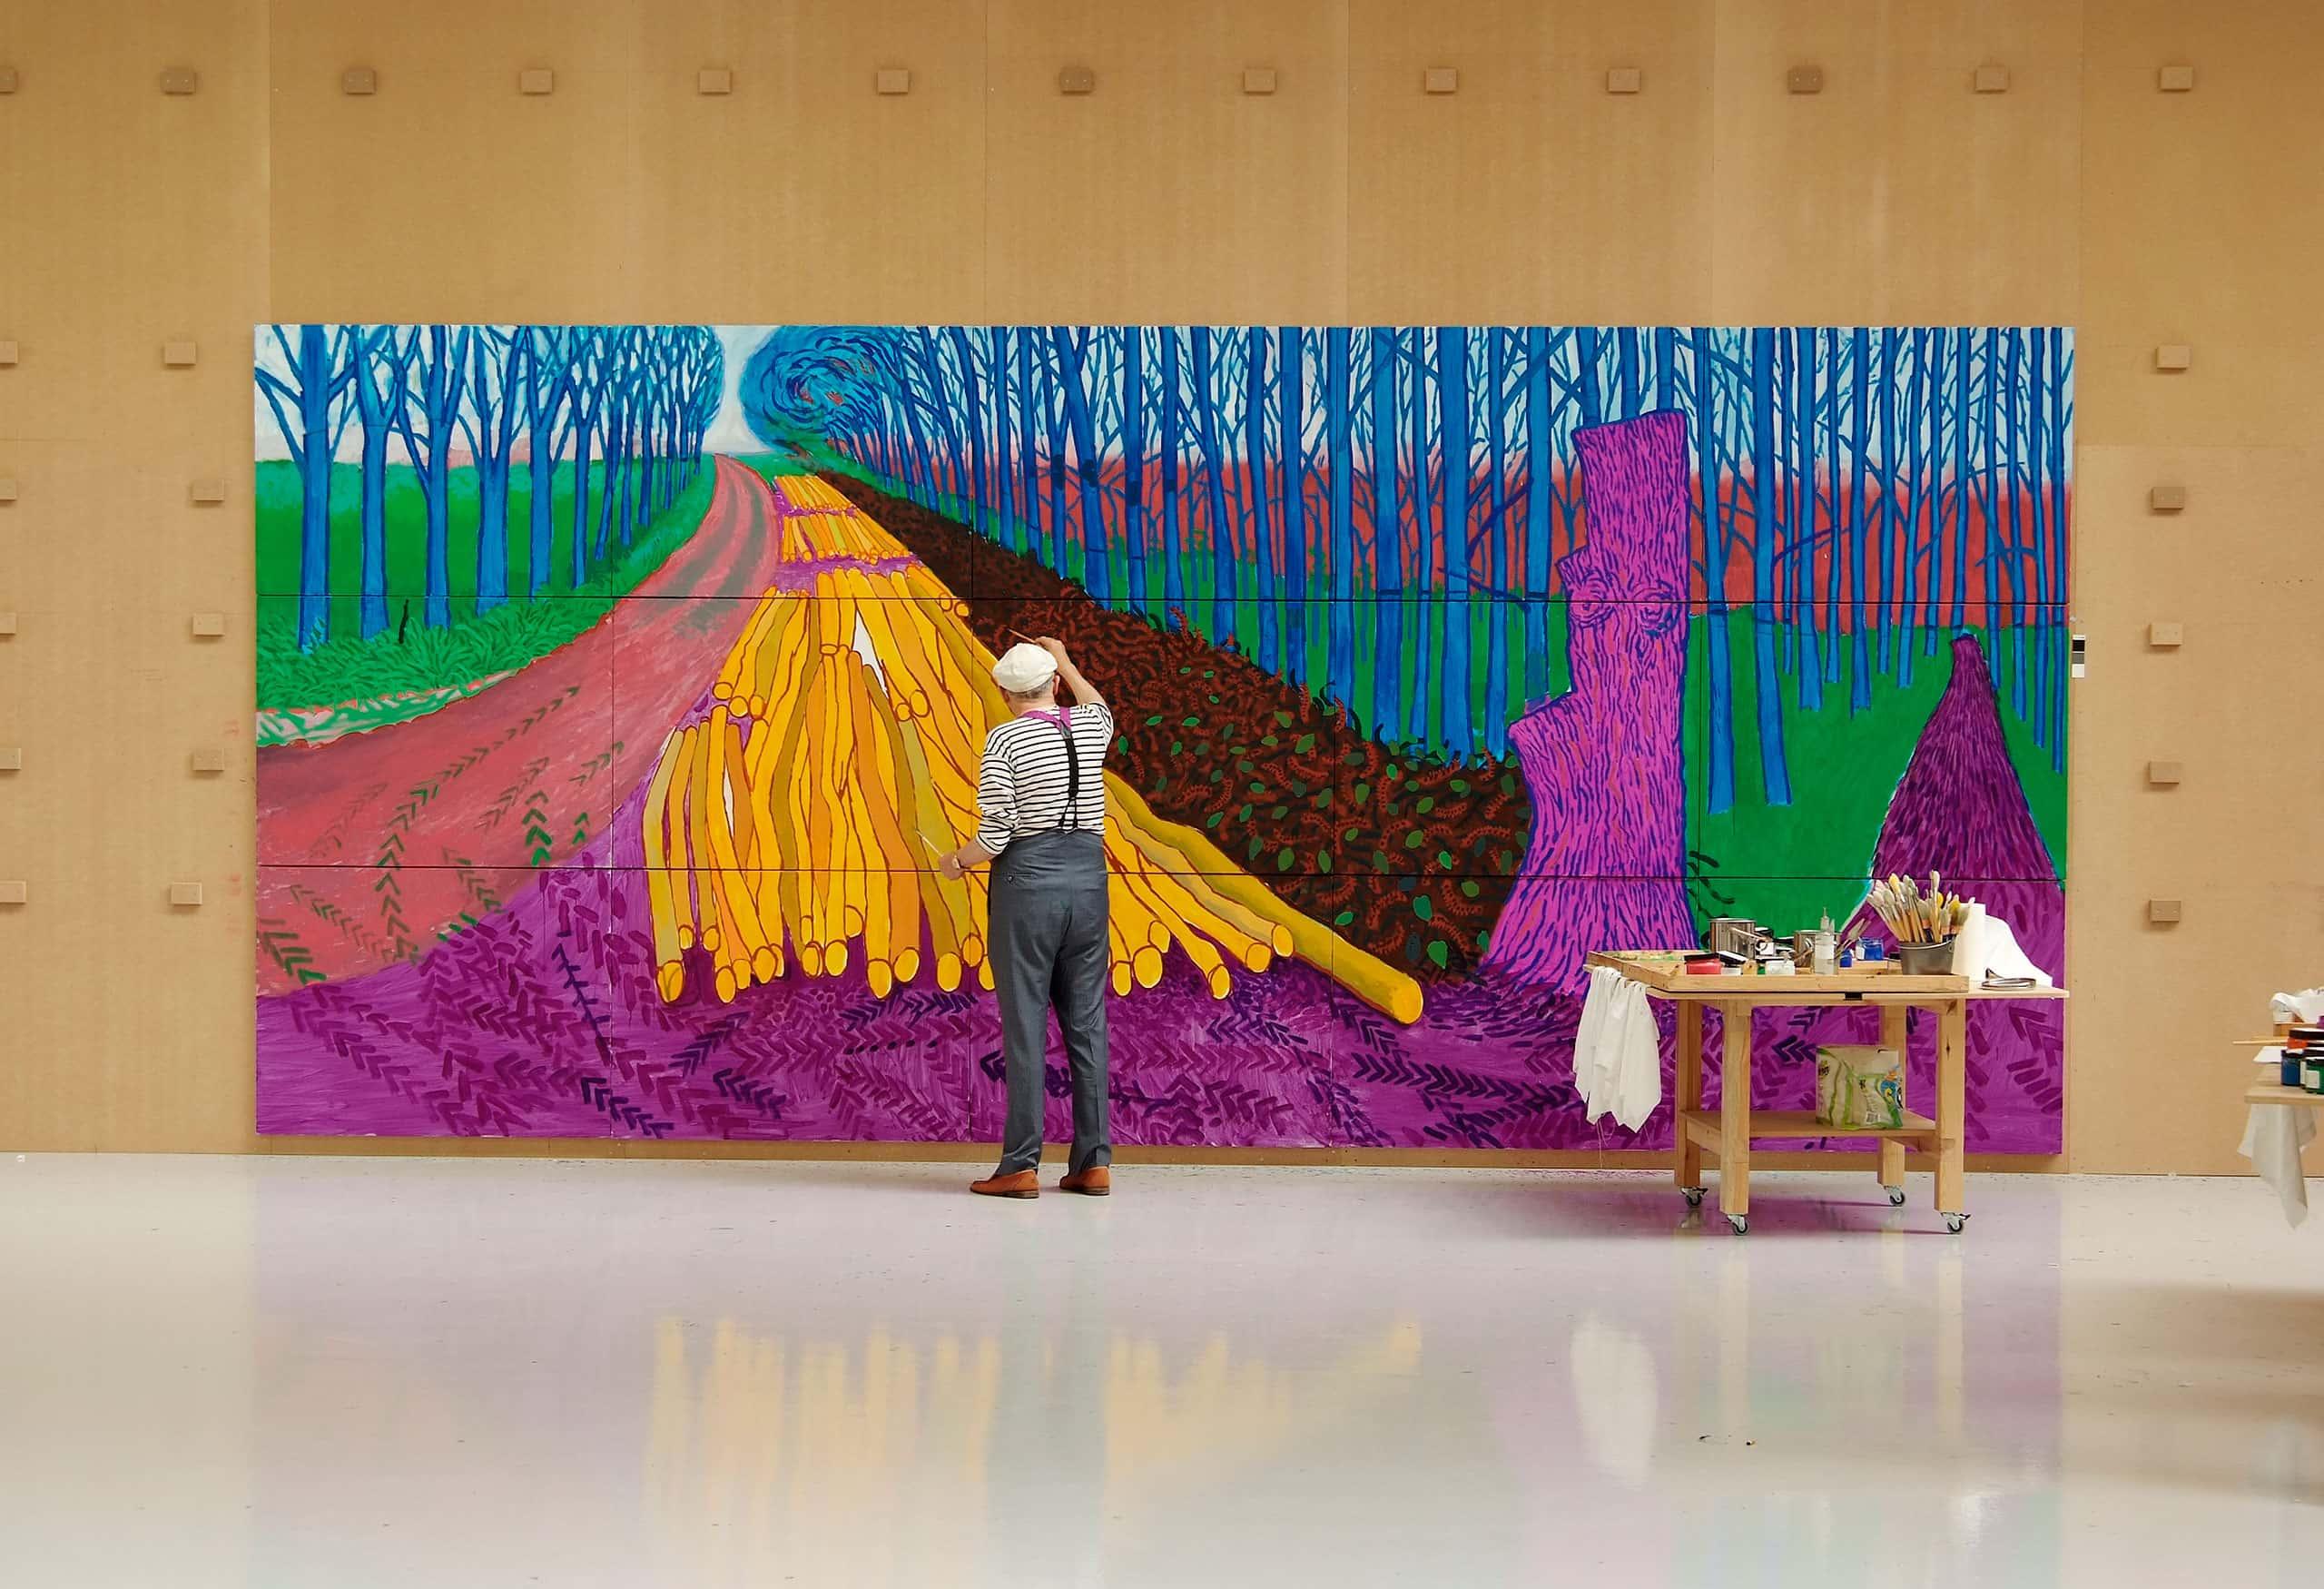 TPS Exhibition on Screen David Hockney